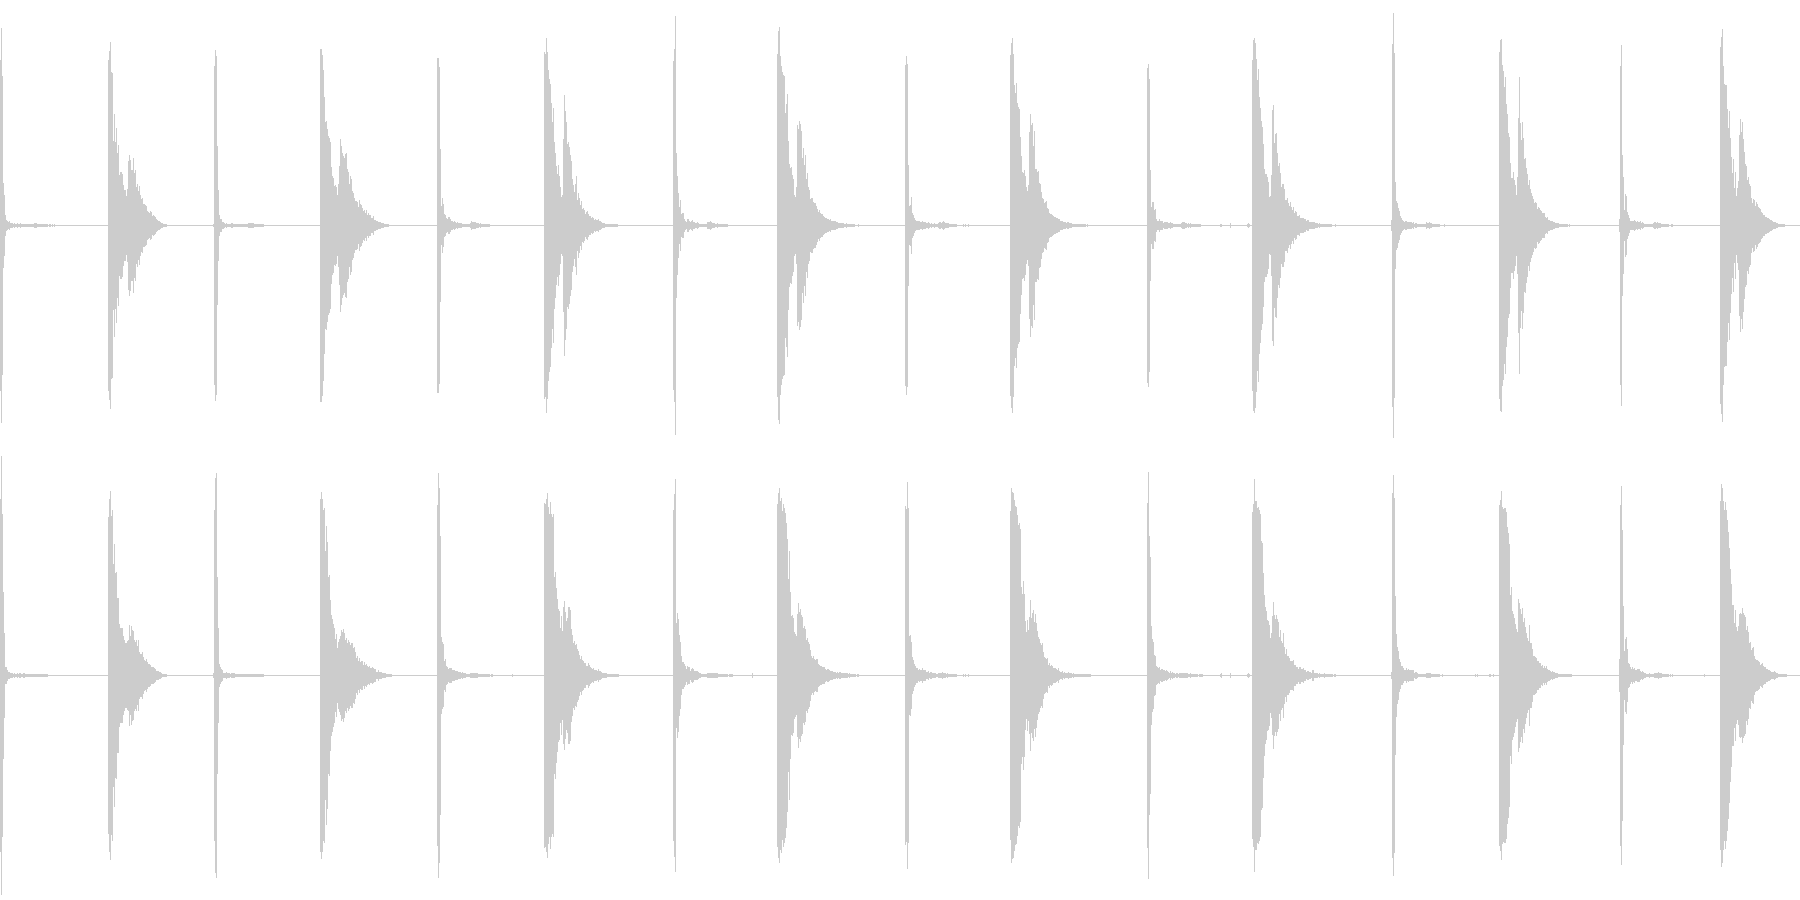 FAMAS F1グレネードランチャ...の未再生の波形